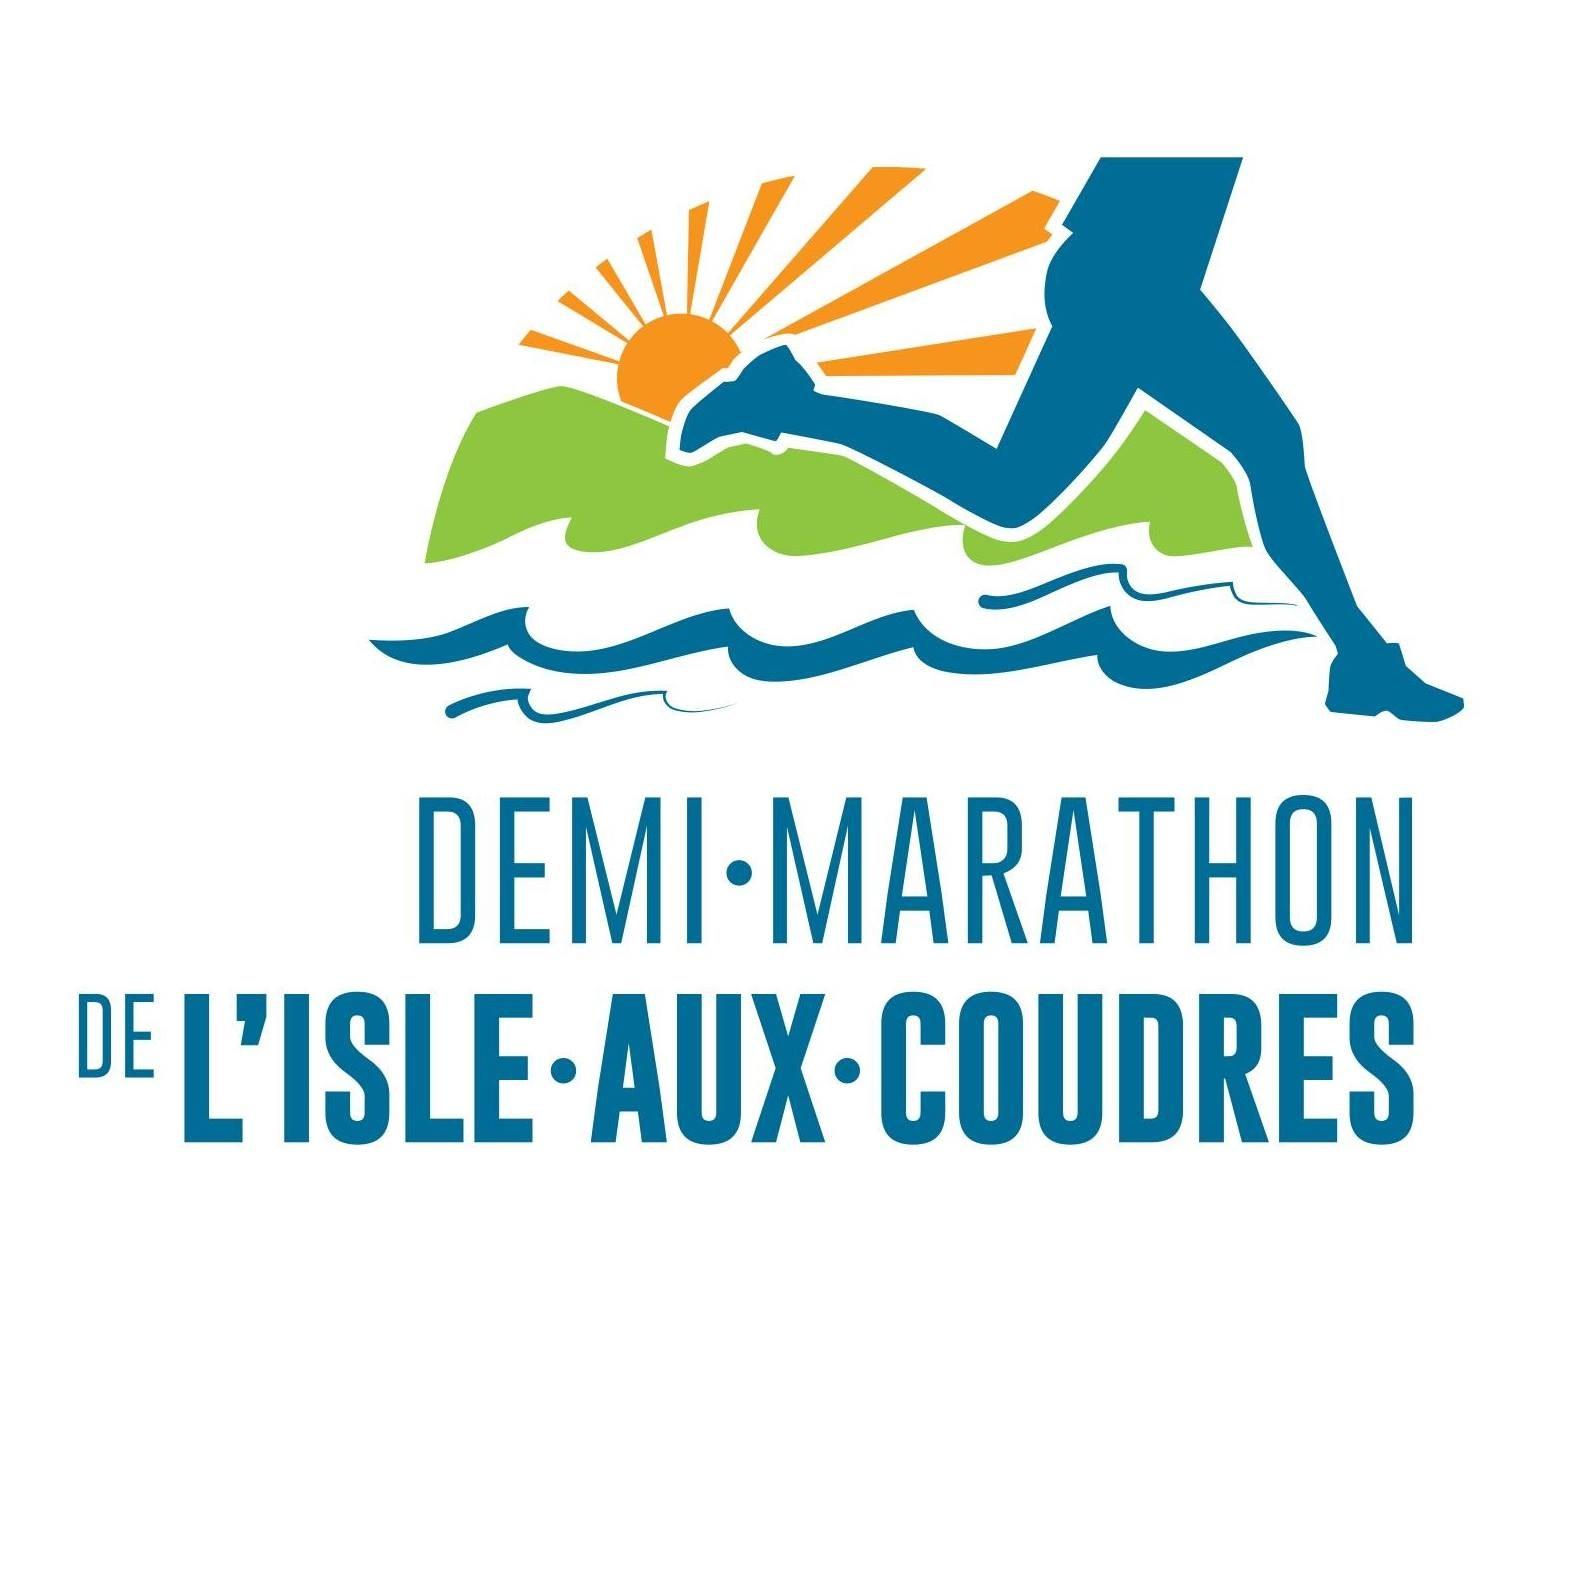 demi-marathon-isle-aux-coudres